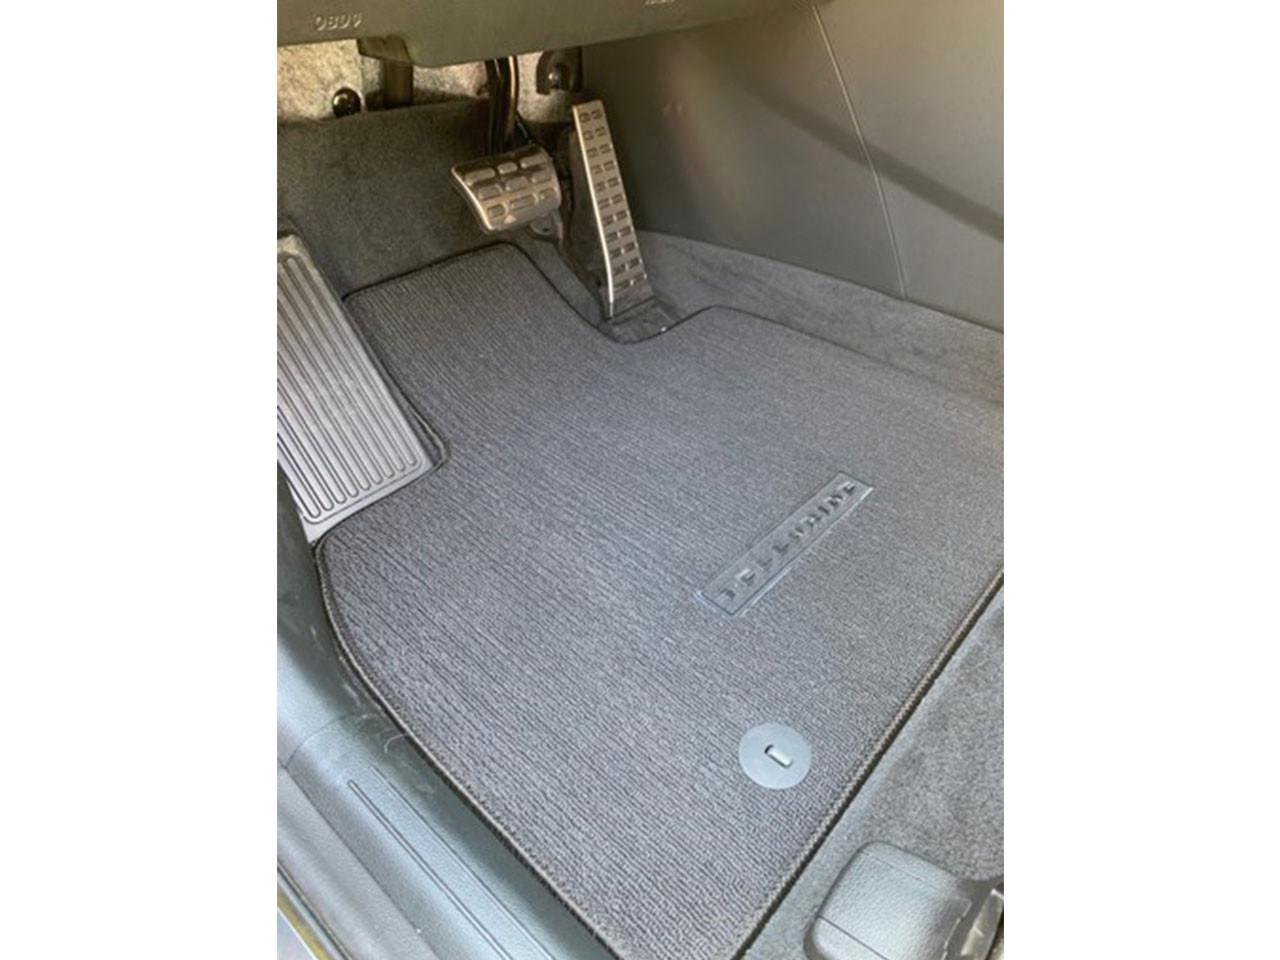 Carpet Floor Mats >> 2020 Kia Telluride Carpet Floor Mats Aa025